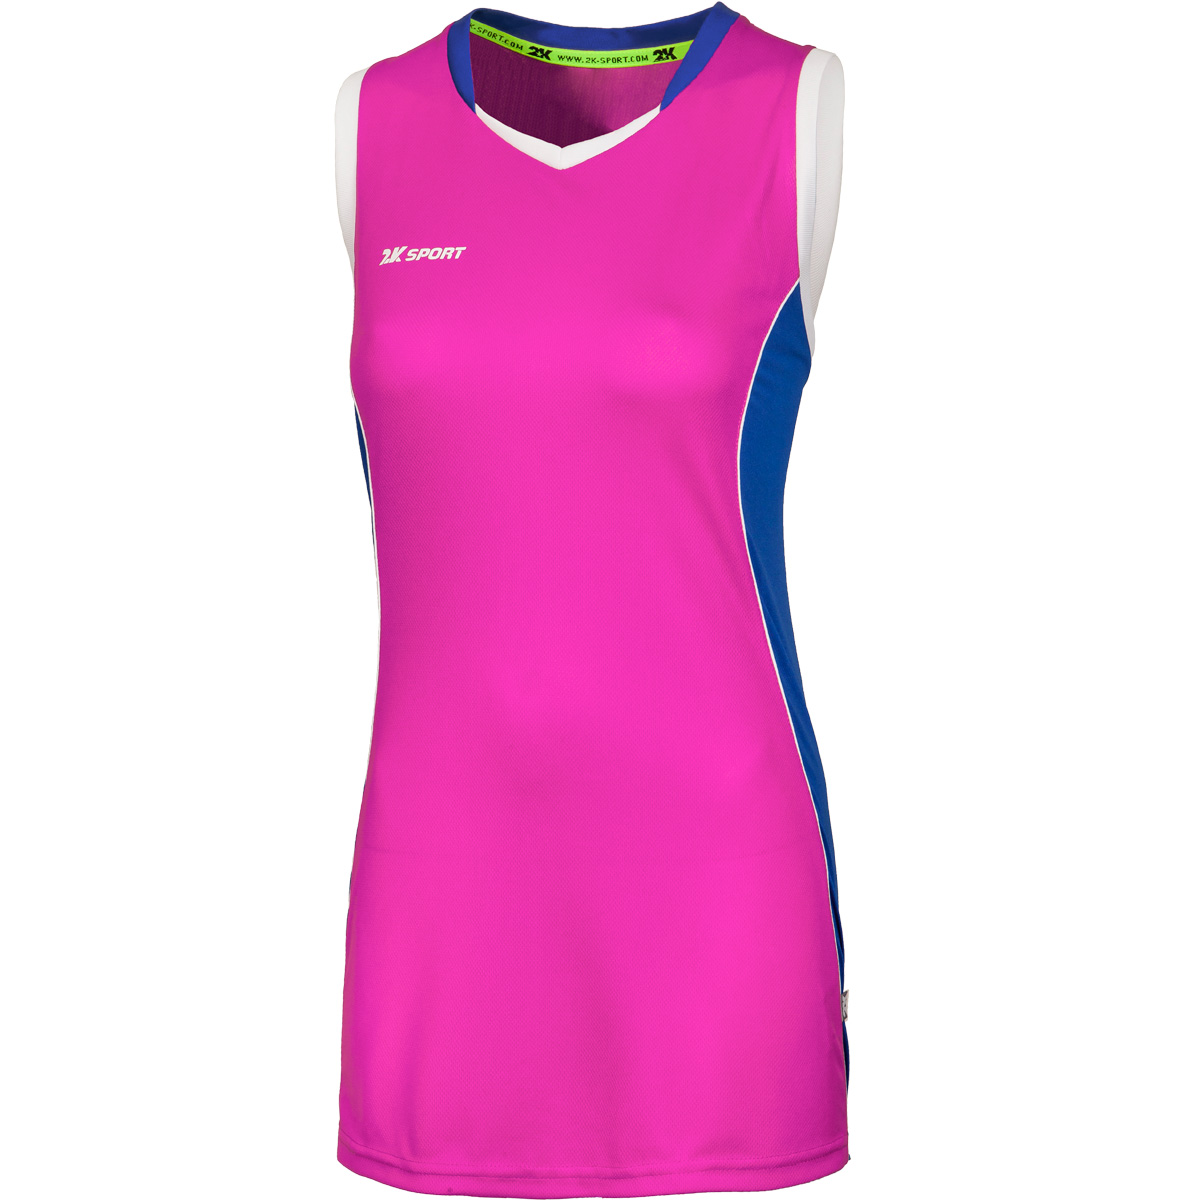 Майка баскетбольная женская 2K Sport Advance, цвет: пурпурный, синий, белый. 130032. Размер M (44/46) - Баскетбол